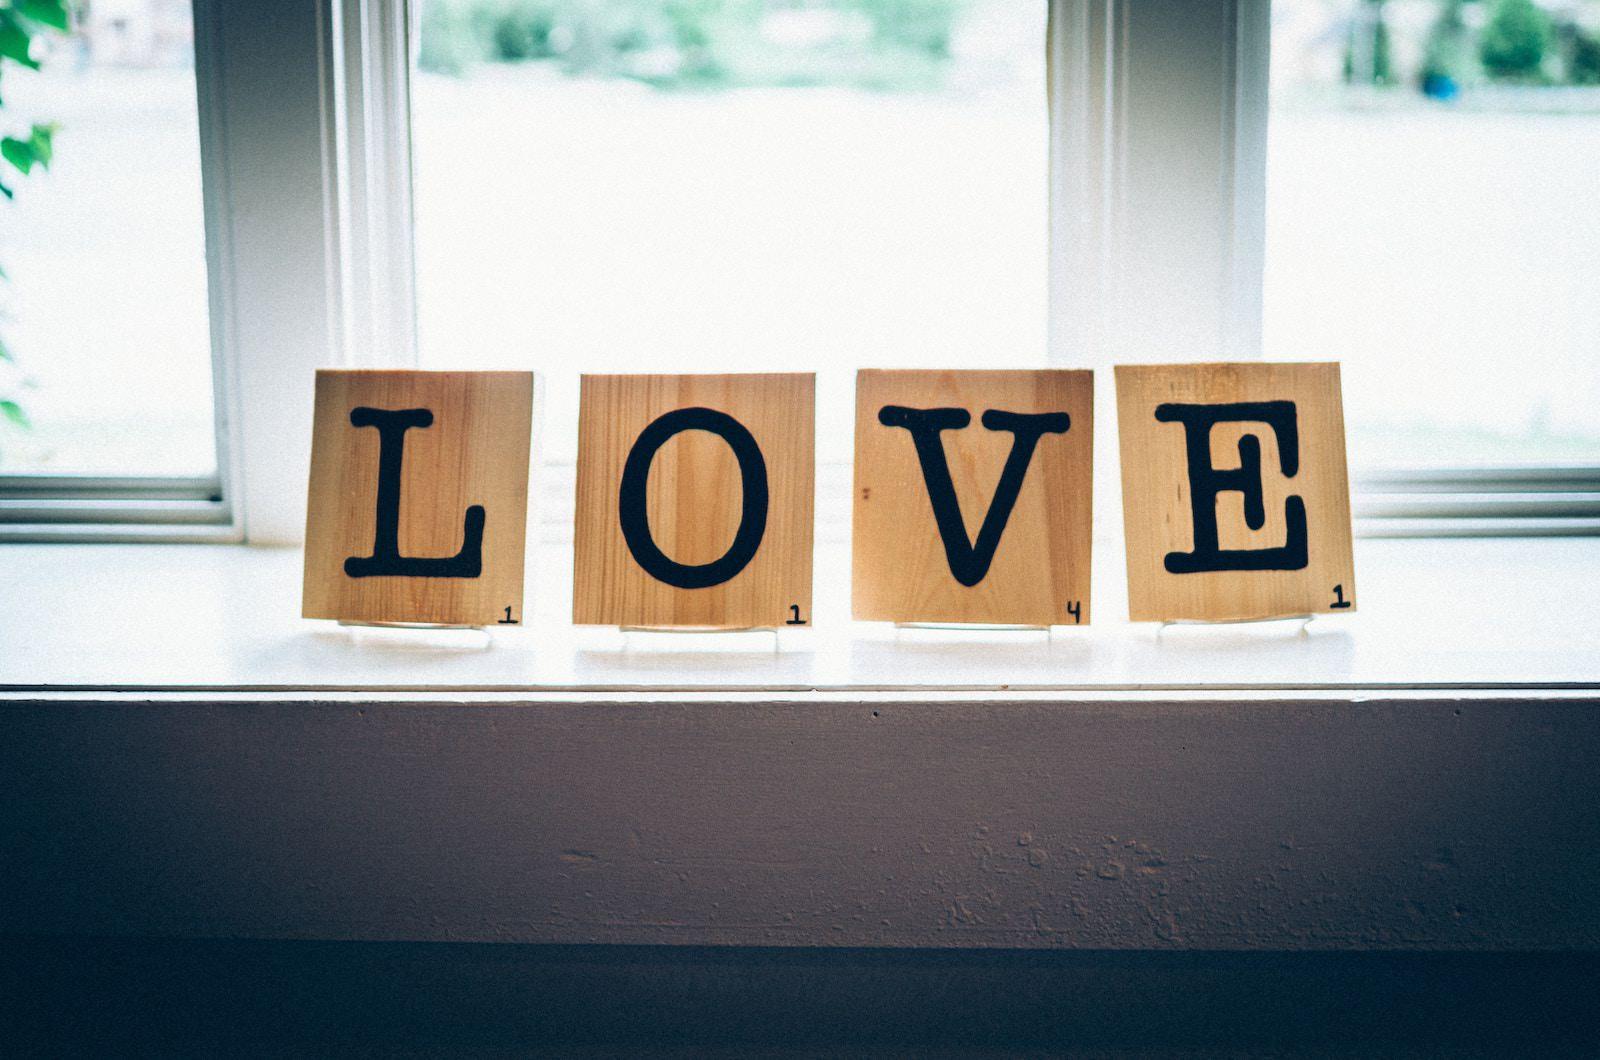 andrew-seaman-597882-unsplash-love-letters